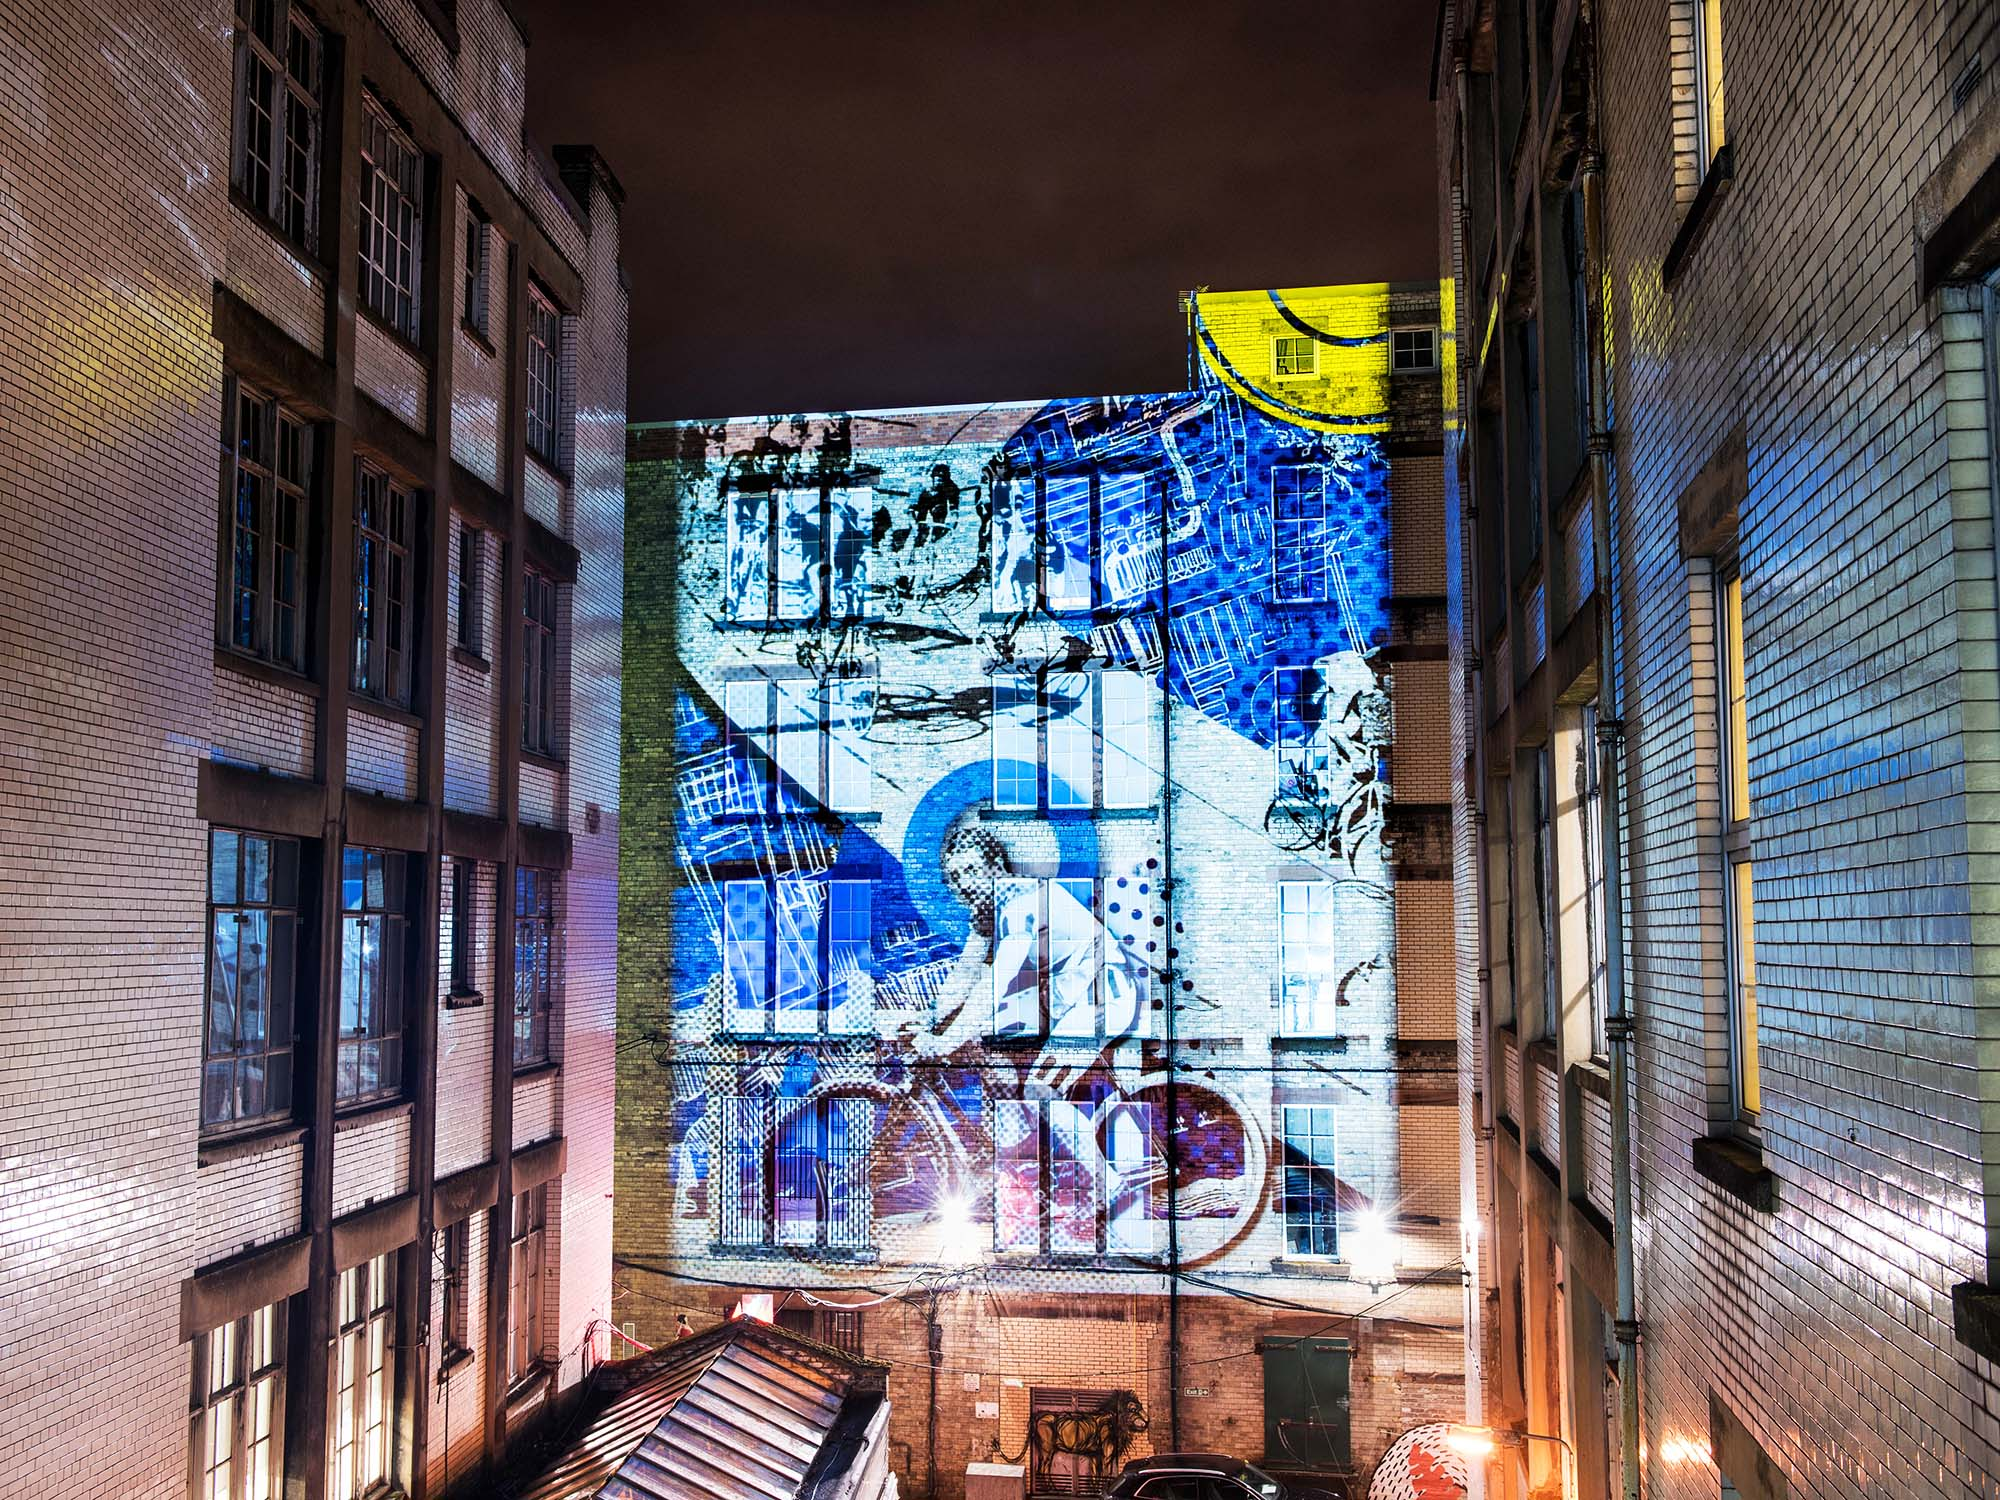 Tontine Lane Glasgow Archive Projection show